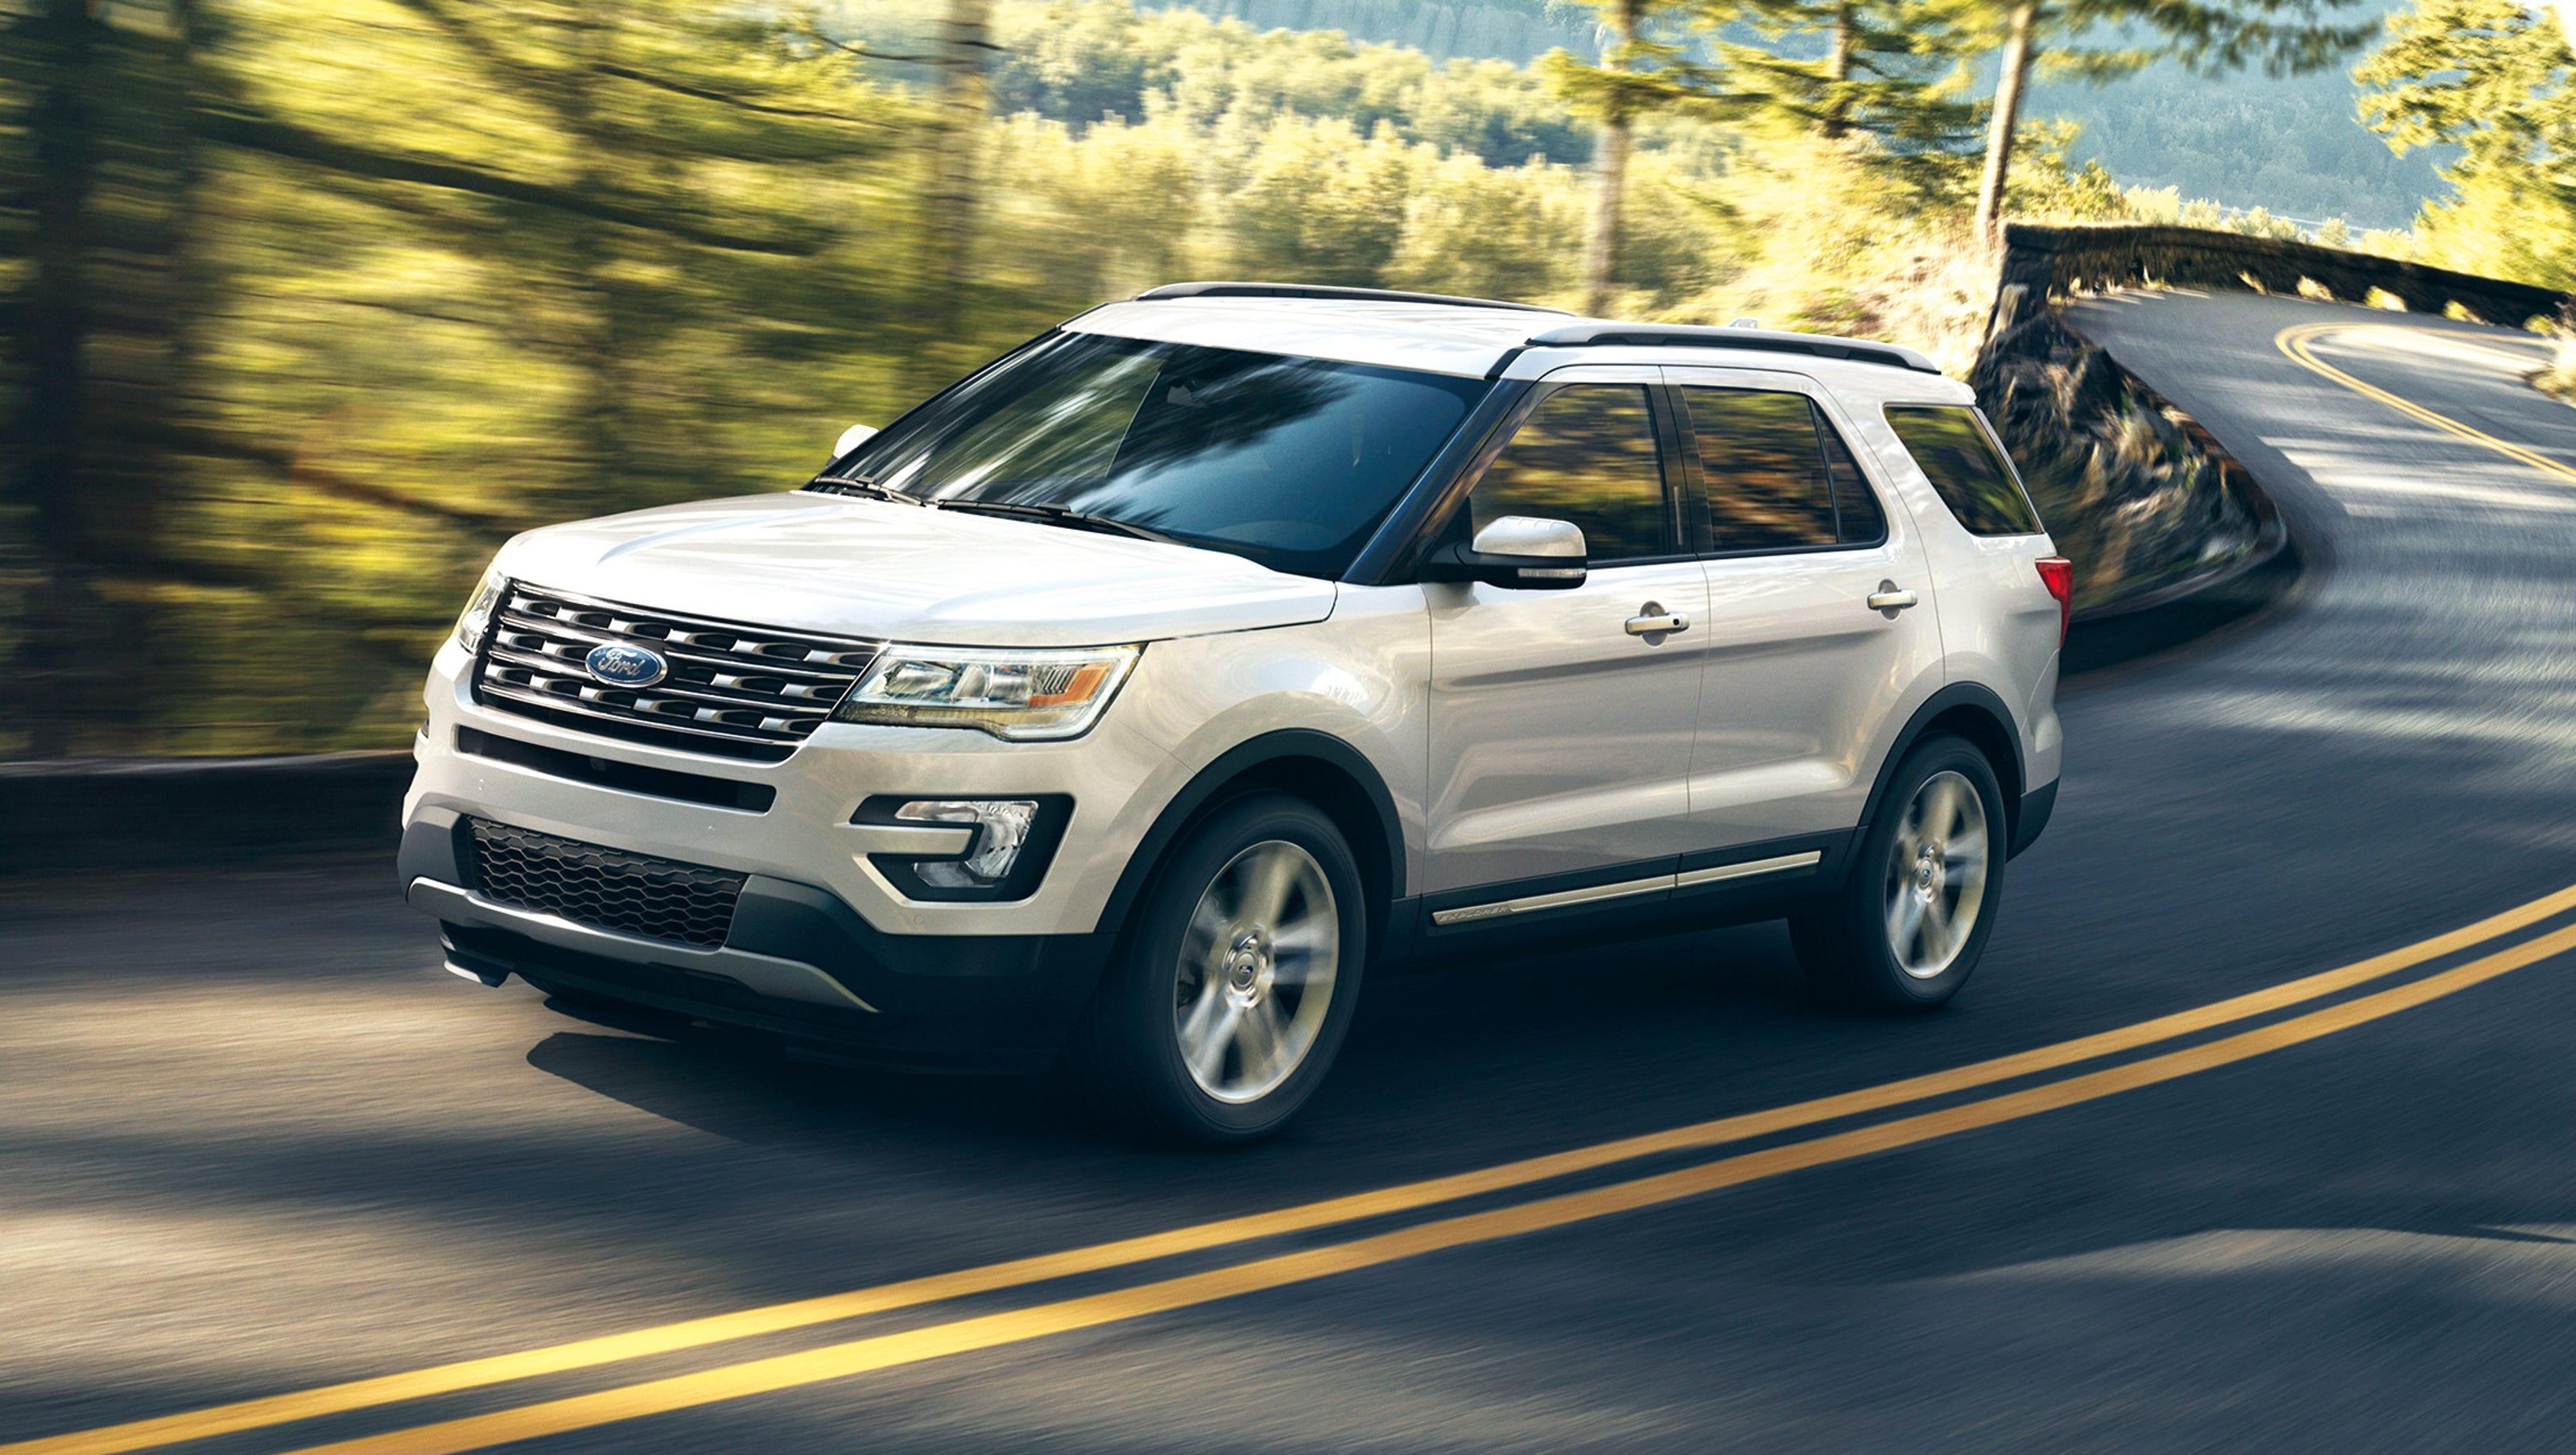 Ford Explorer Exhaust Recall Top Car Reviews 2019 2020